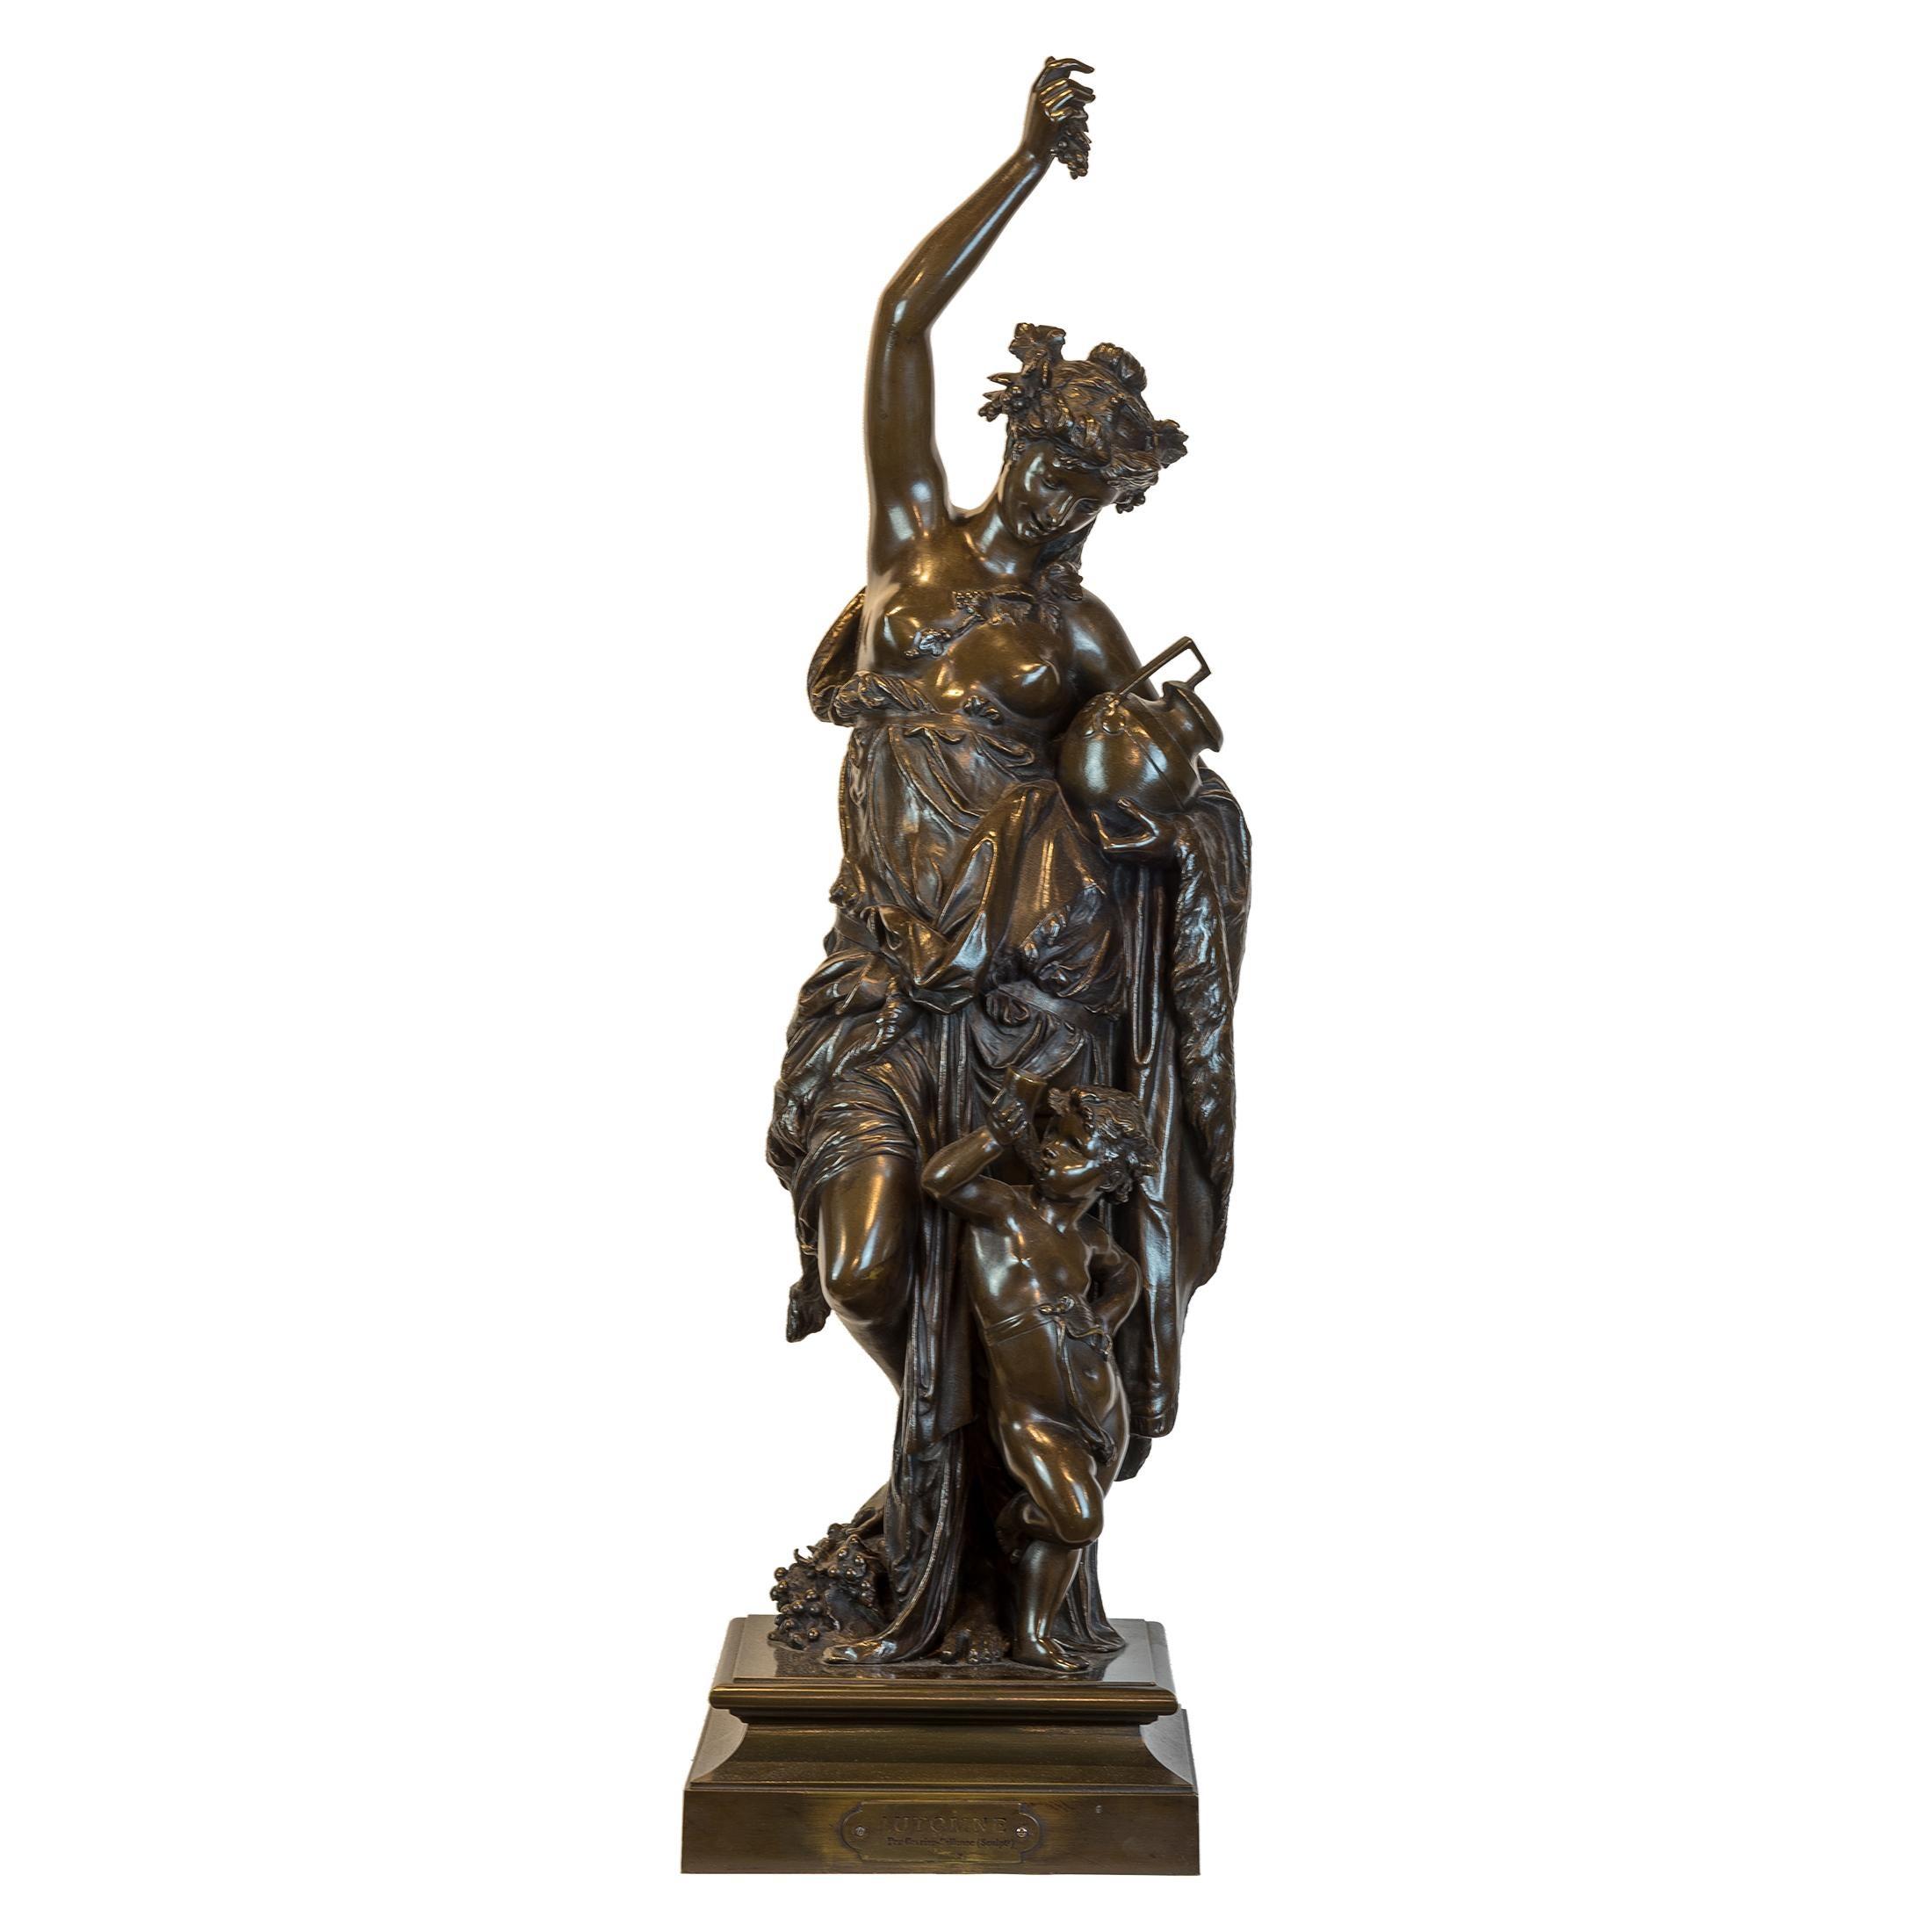 Fine Patinated Bronze Sculpture by Albert Carrier-Belleuse